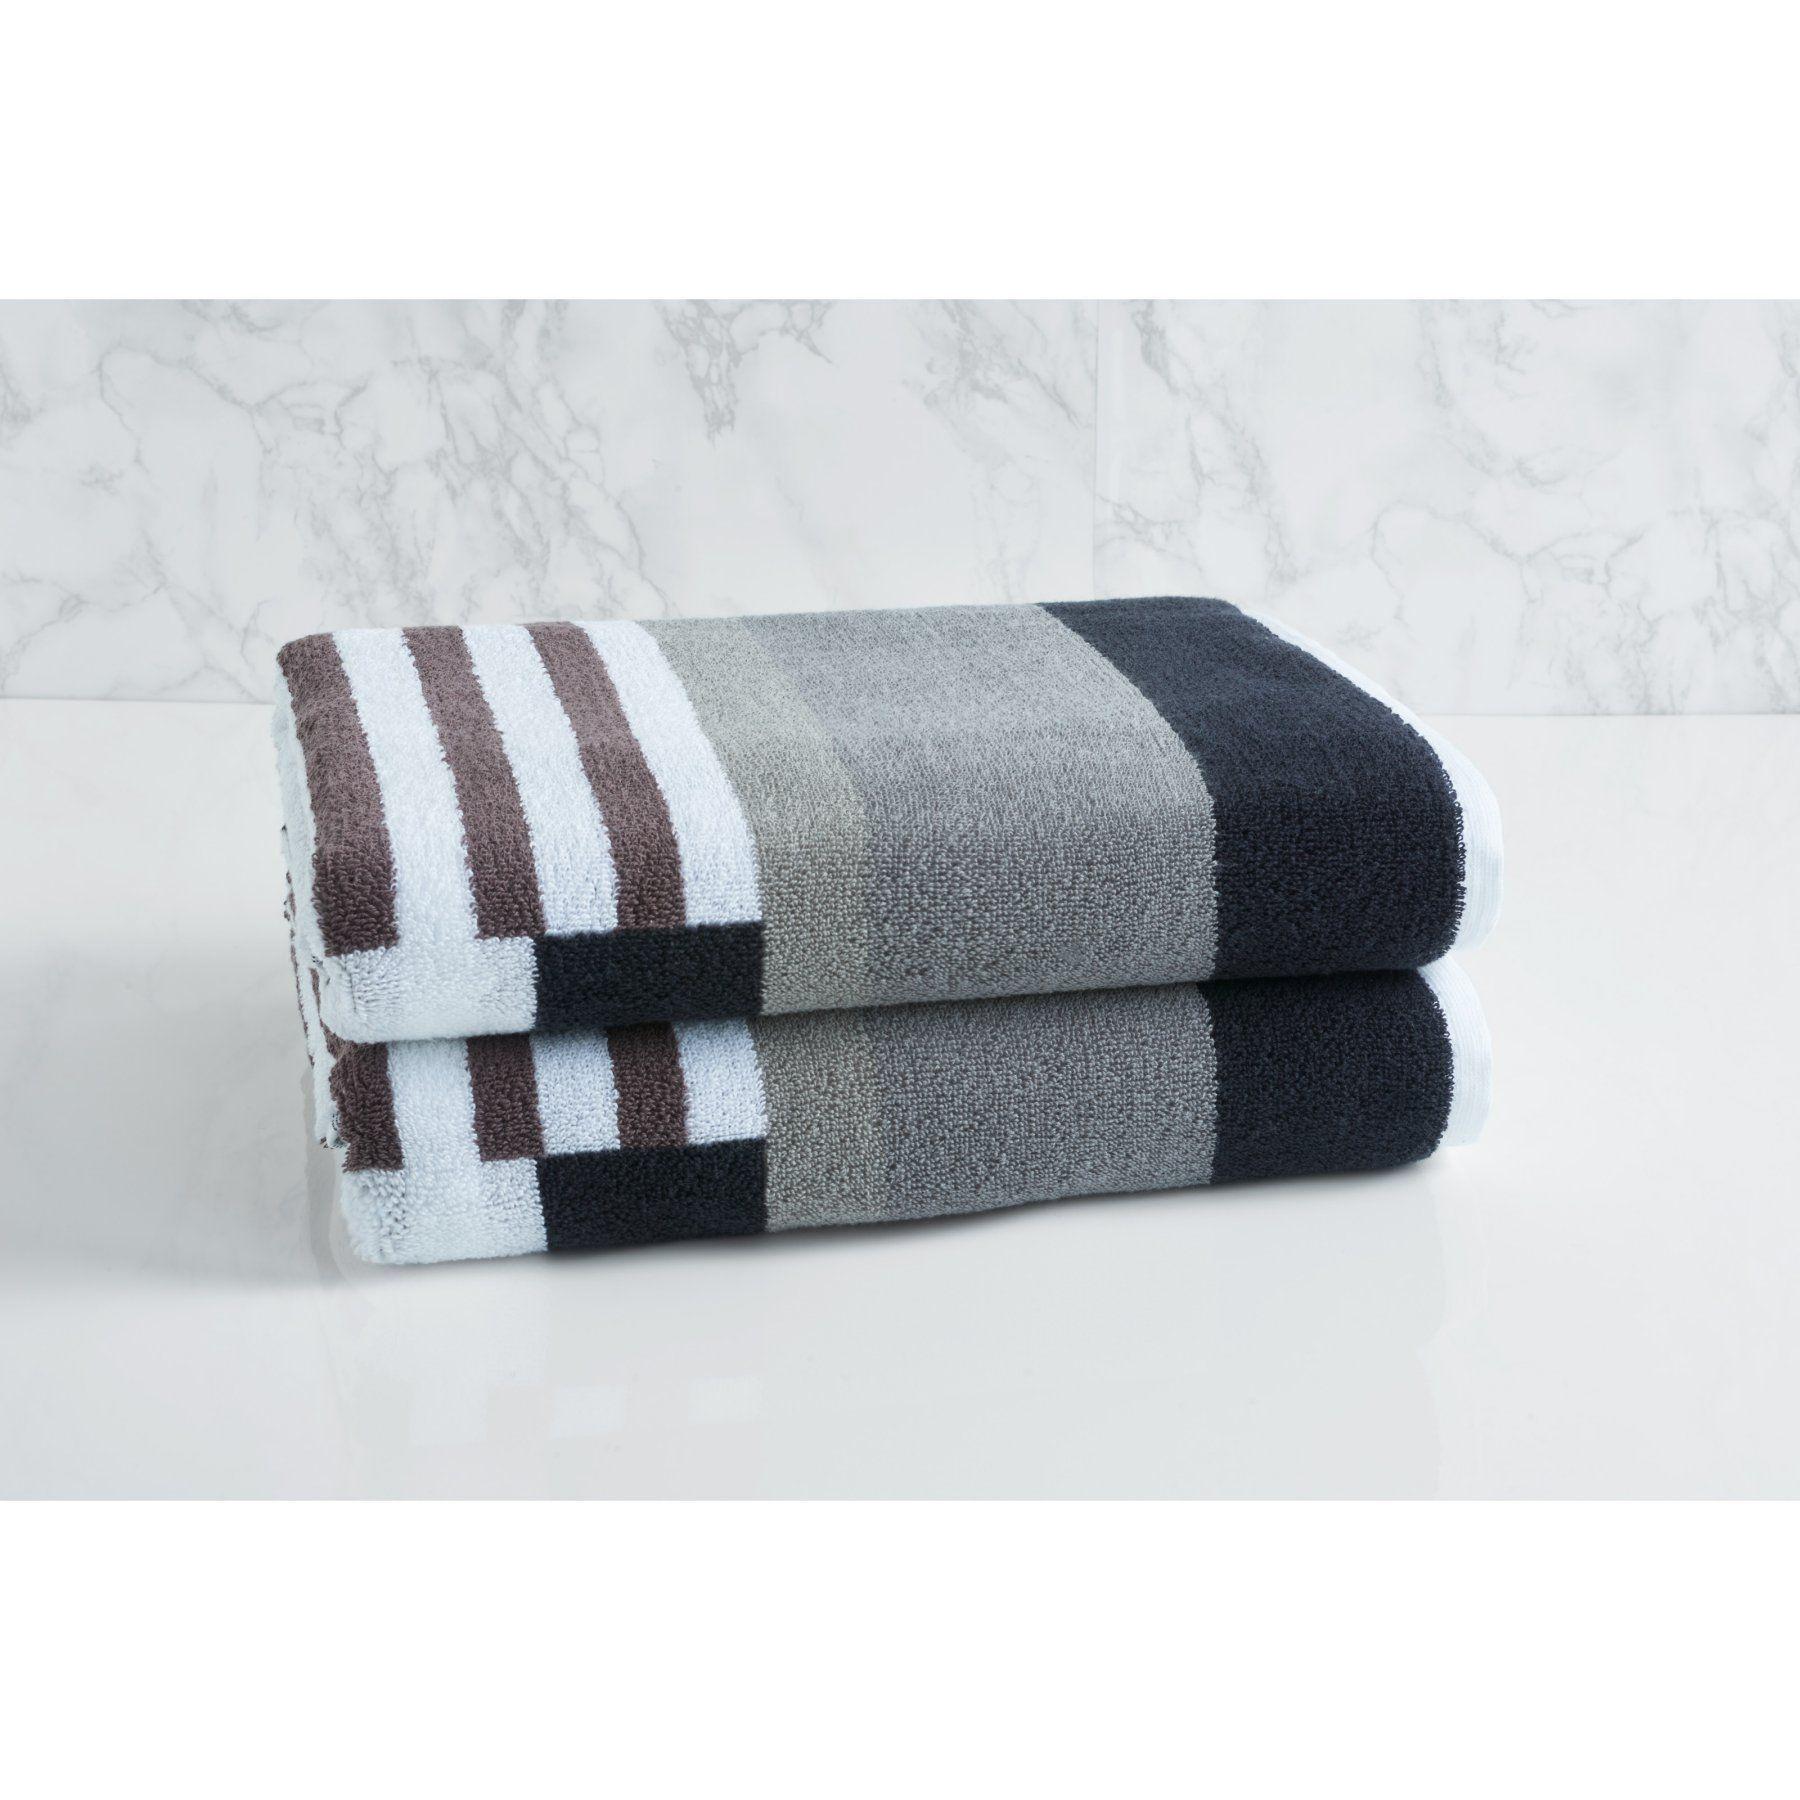 Loft By Loftex Trestle Cotton Bath Towel 3331 B3056 Grayopti